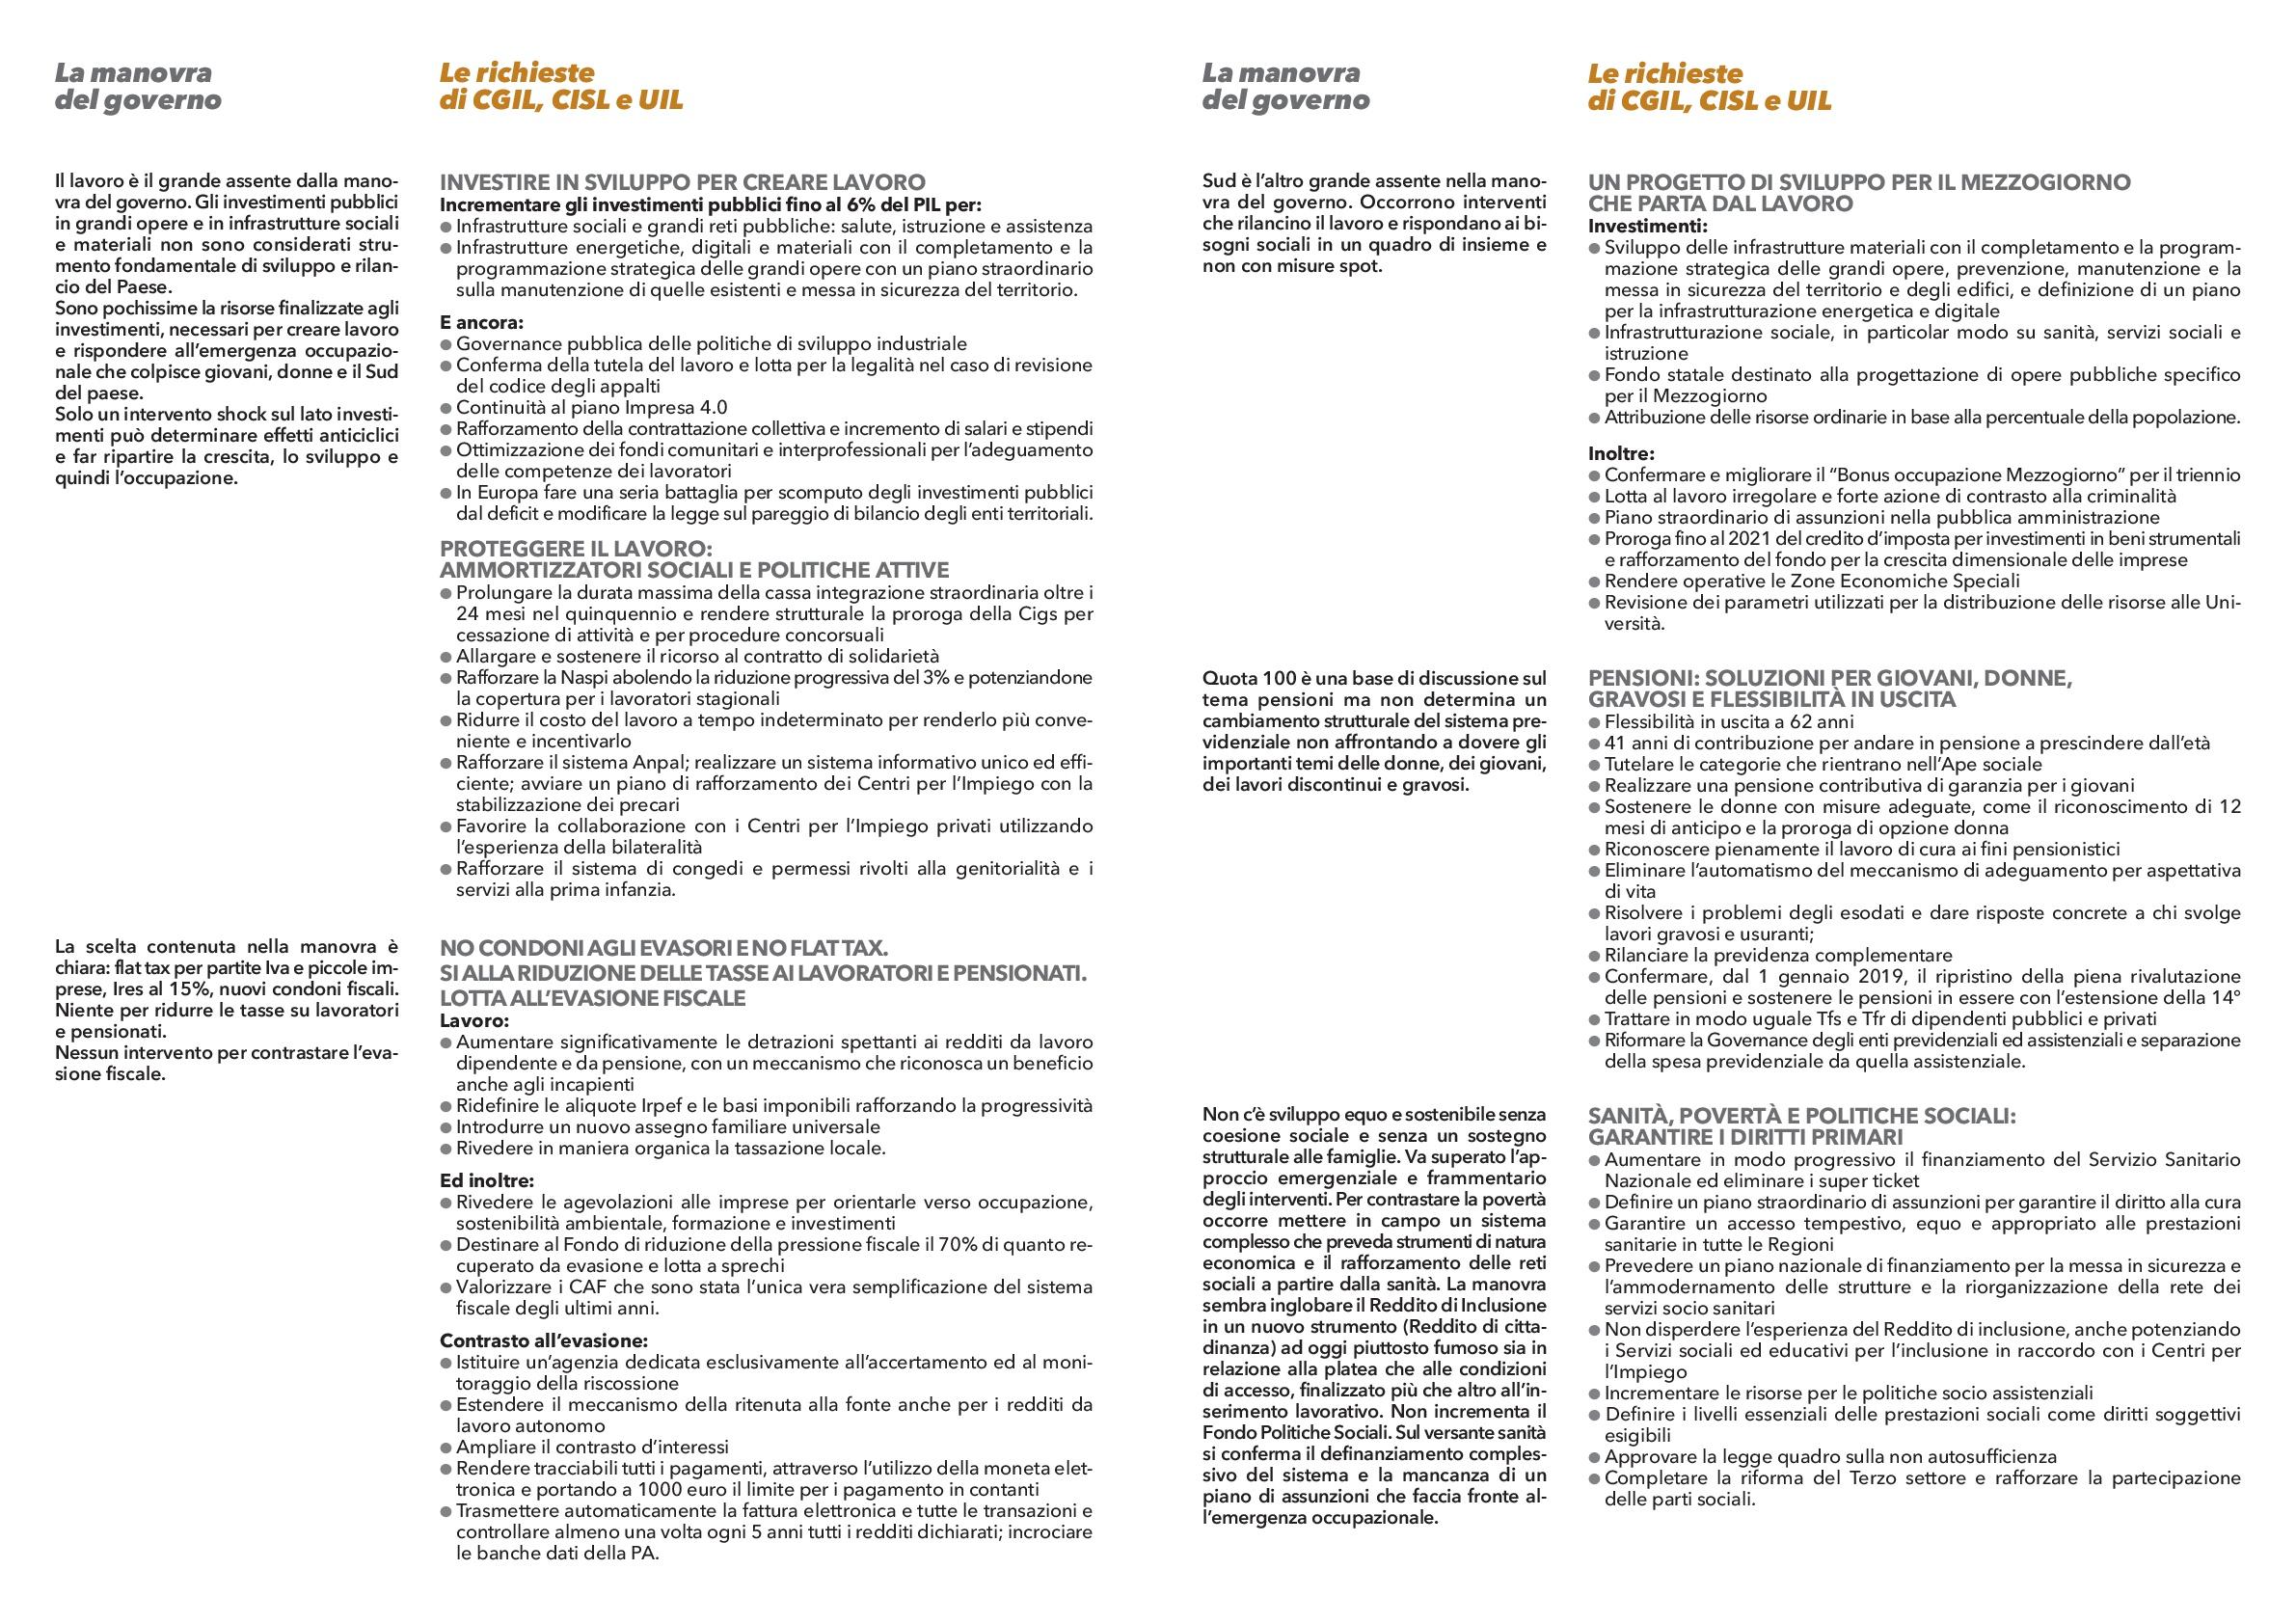 00138404.pdfVolantone-Attivi-Unitari-Cgil-Cisl-Uil-002